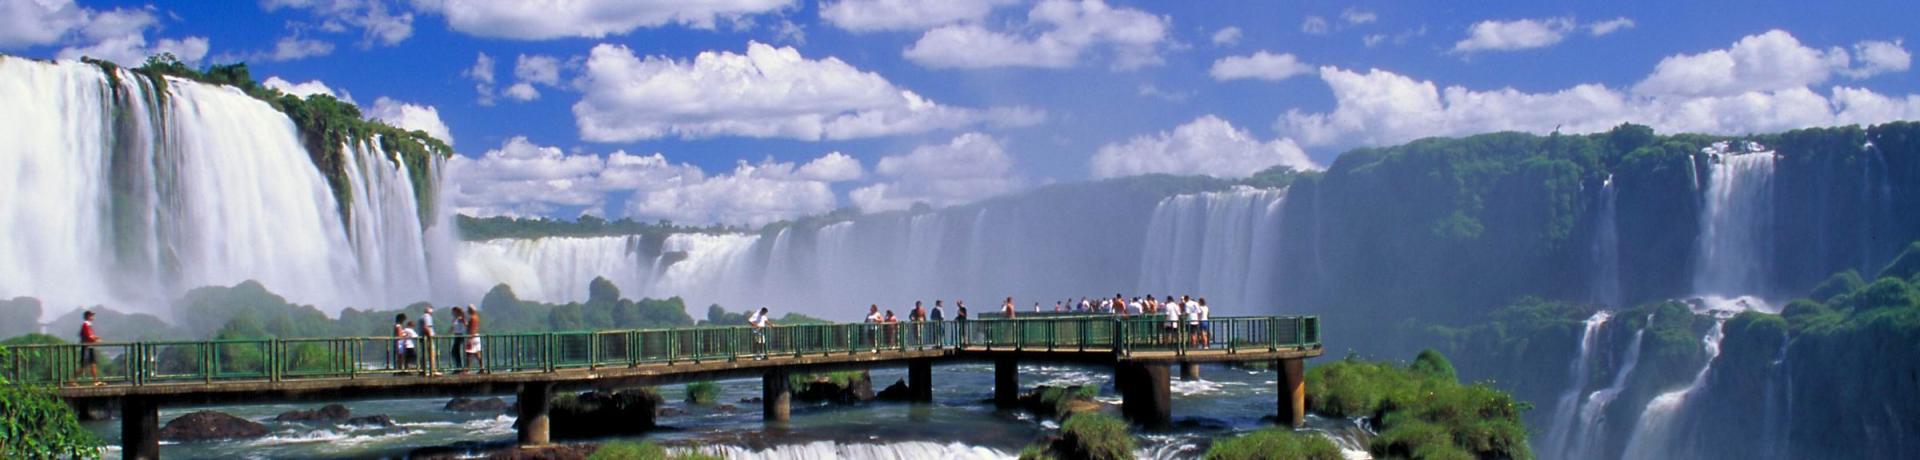 brazil-iguasu.jpg